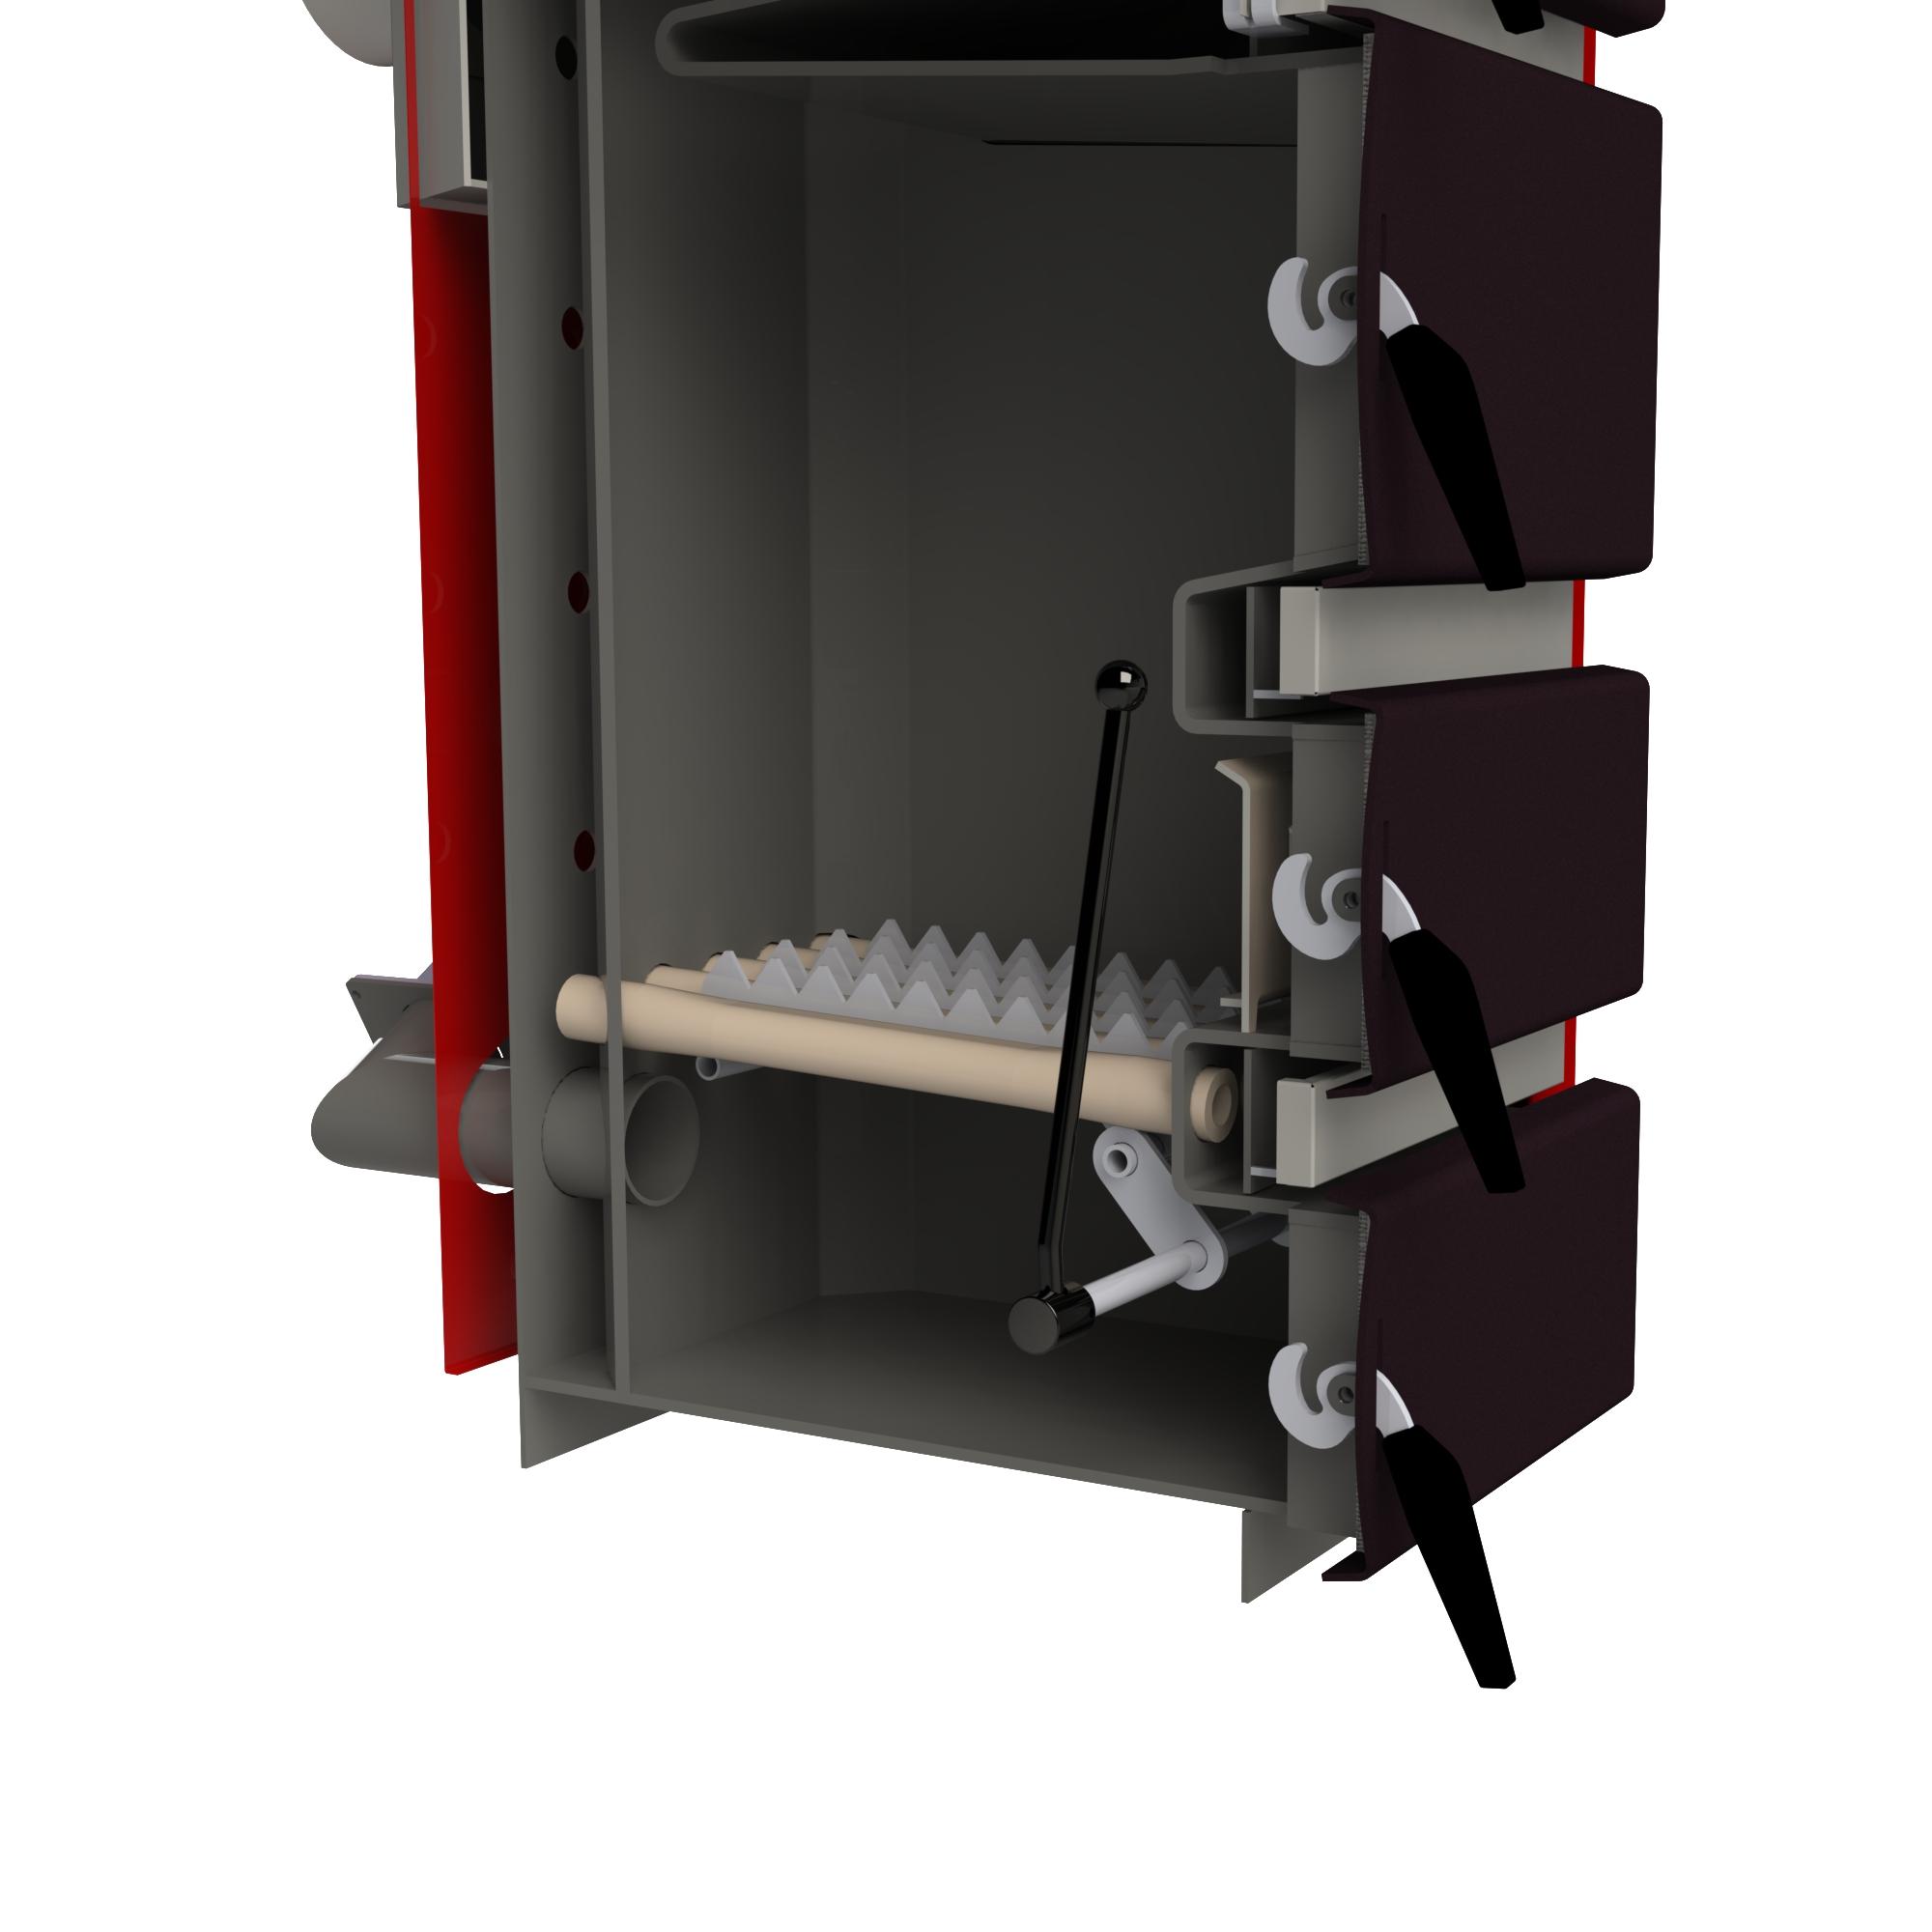 Твердотопливный котел Elektromet EKO-KWW Strong 28 фото3